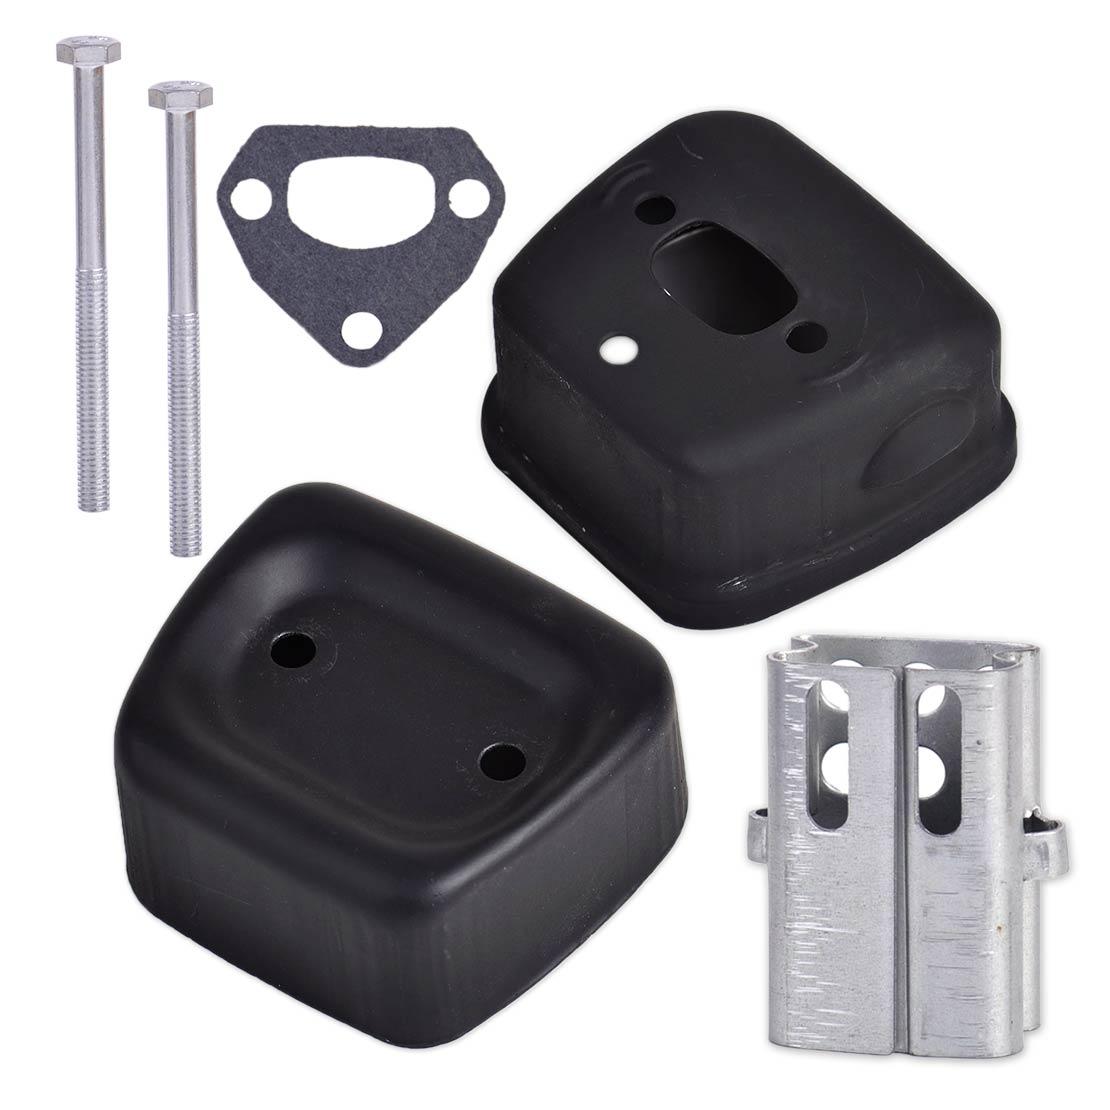 LETAOSK New Exhaust Muffler Gasket Bolt Kit Tool Fit For Husqvarna 142 137 141 36 41 Chainsaws